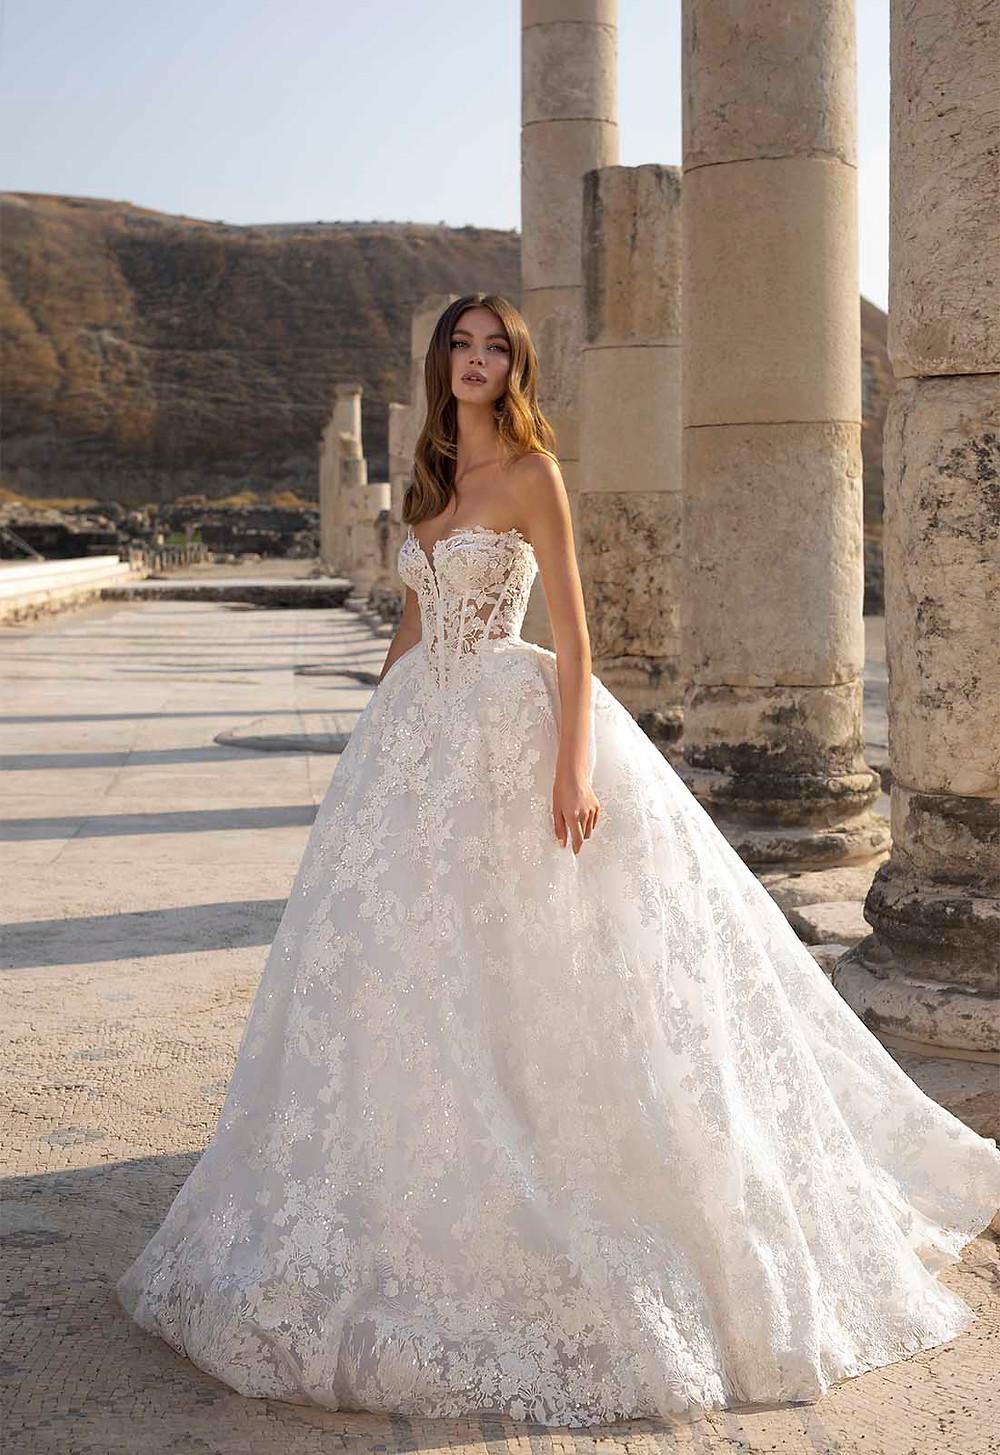 A Pnina Tornai strapless lace princess ball gown wedding dress